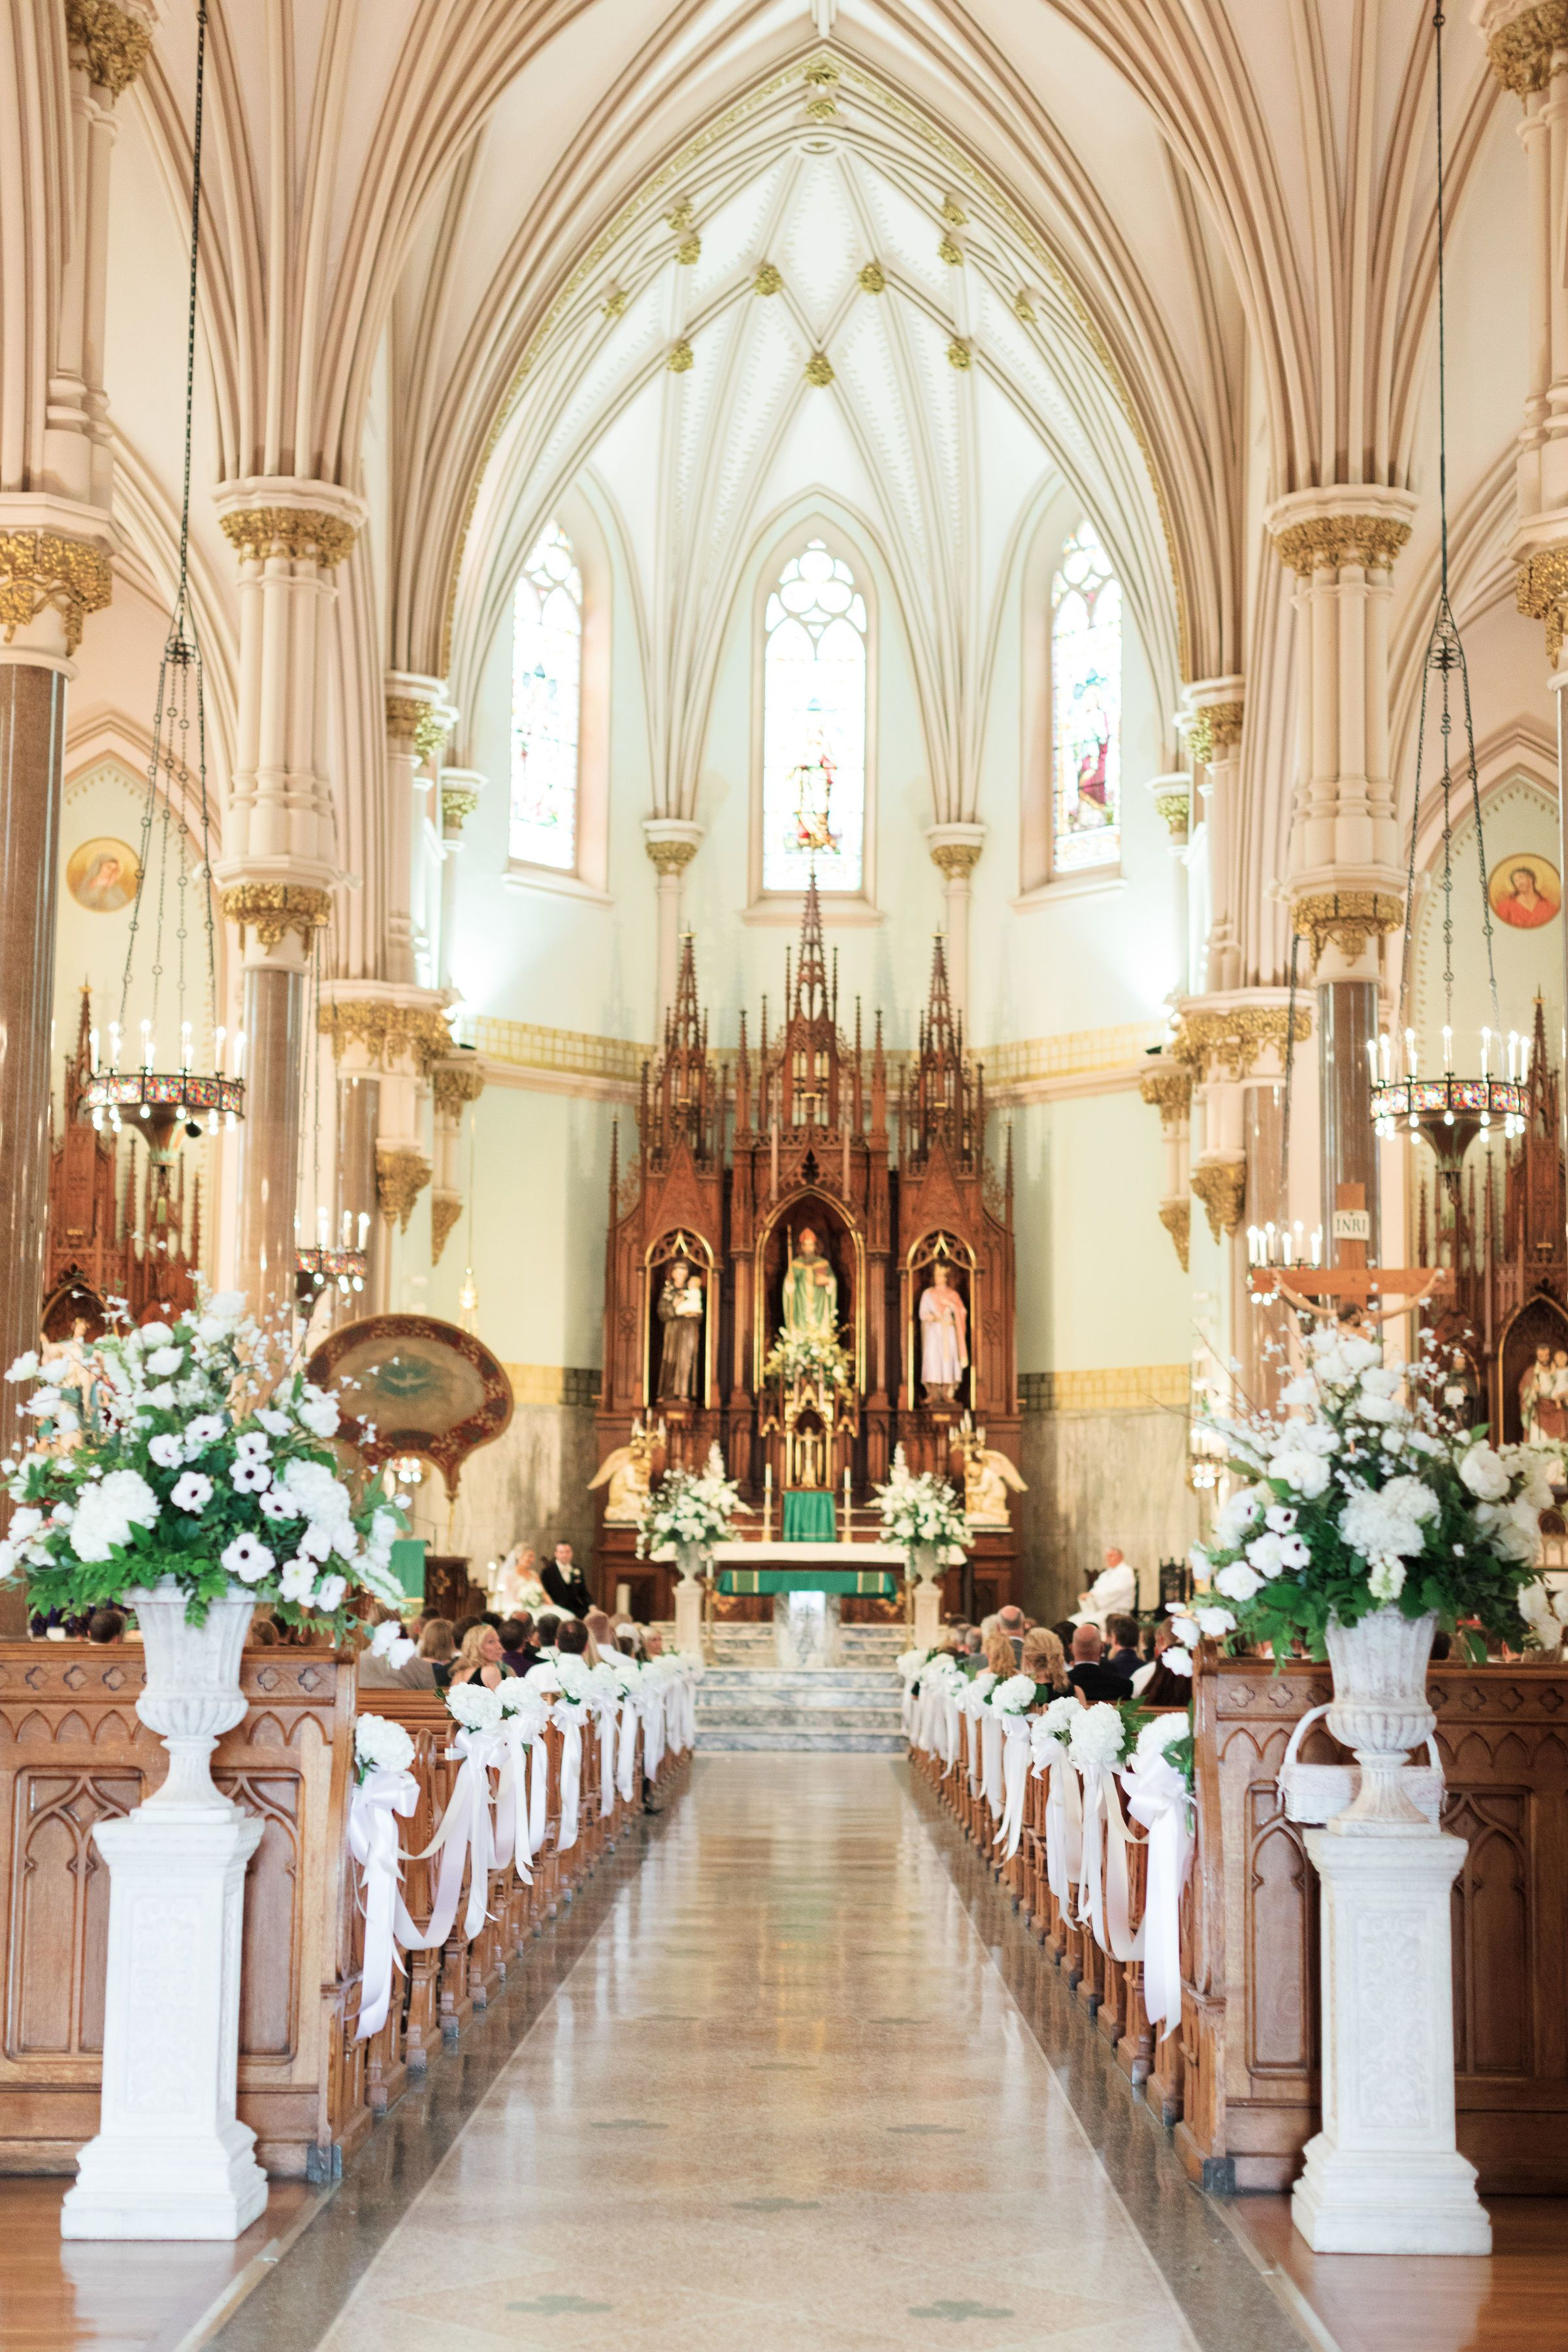 Modern Ethereal Wedding At Toledo Glass Pavilion In Ohio Wedding Church Decor Ethereal Wedding Church Wedding Decorations